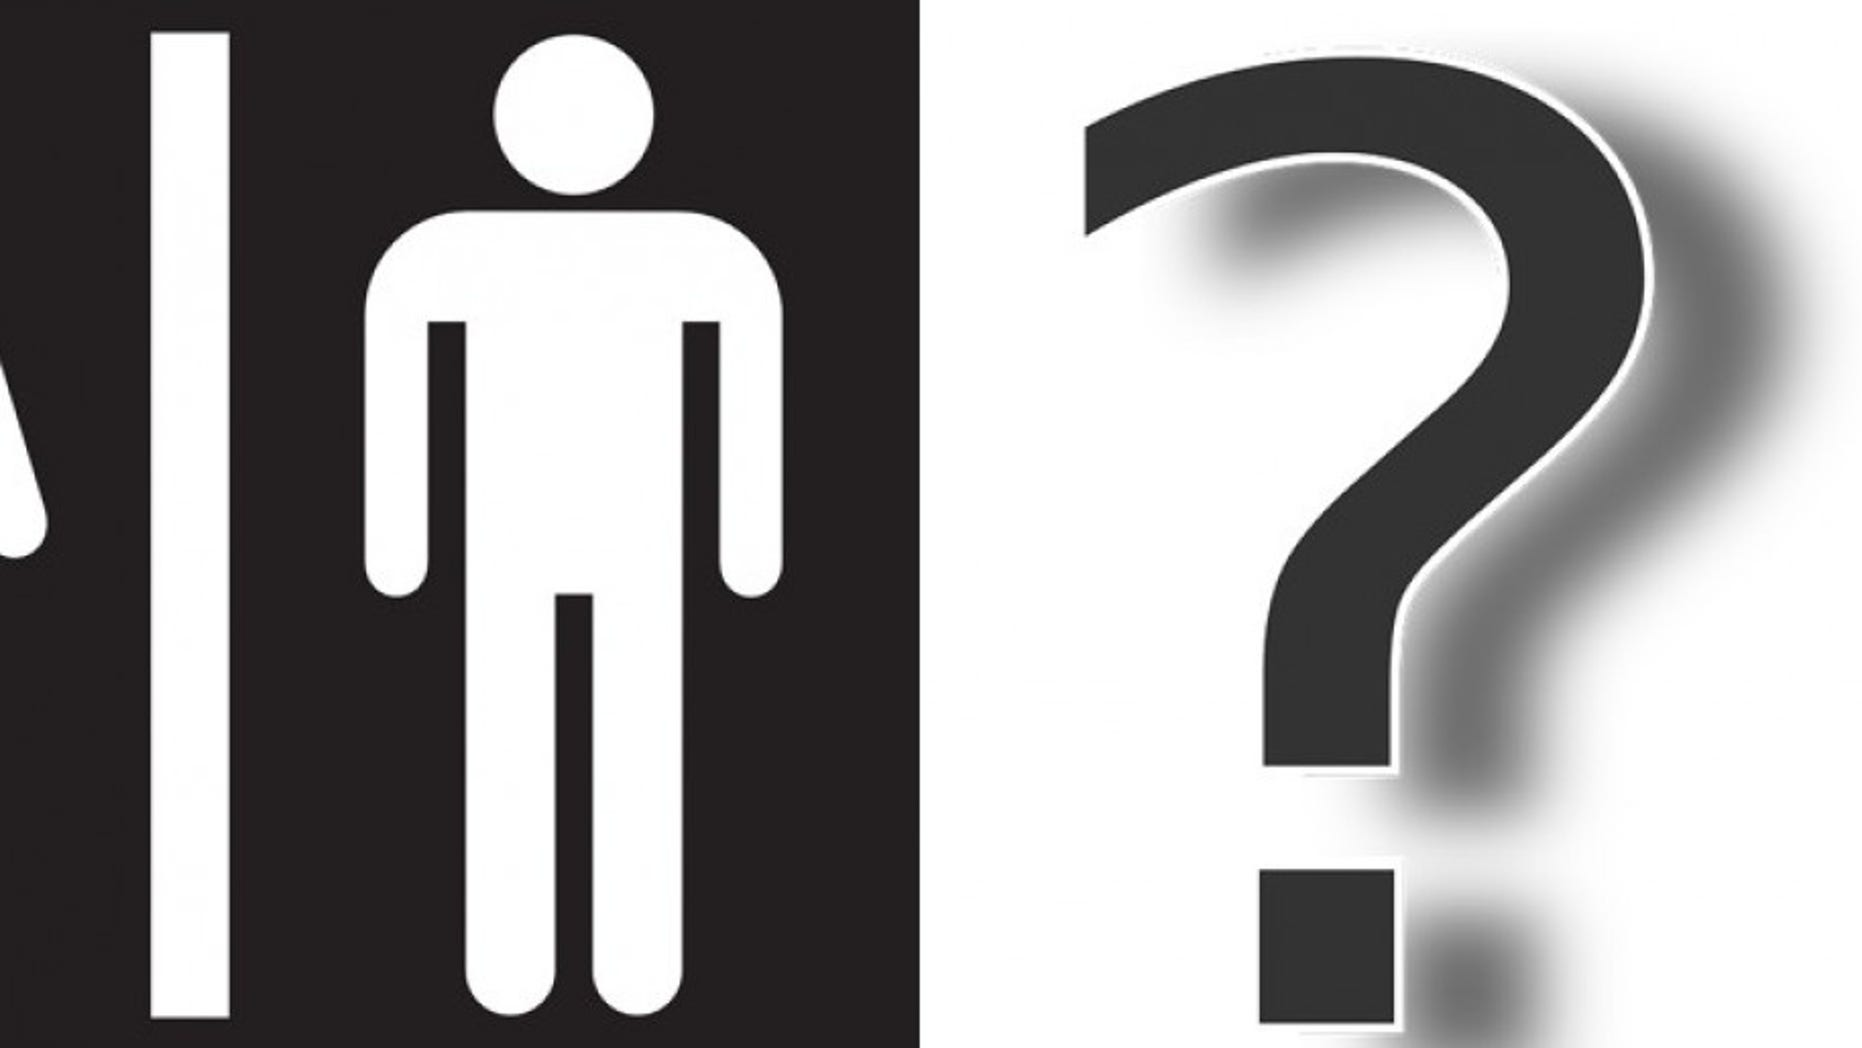 Transgender Bathrooms (Photos: Stock Images)